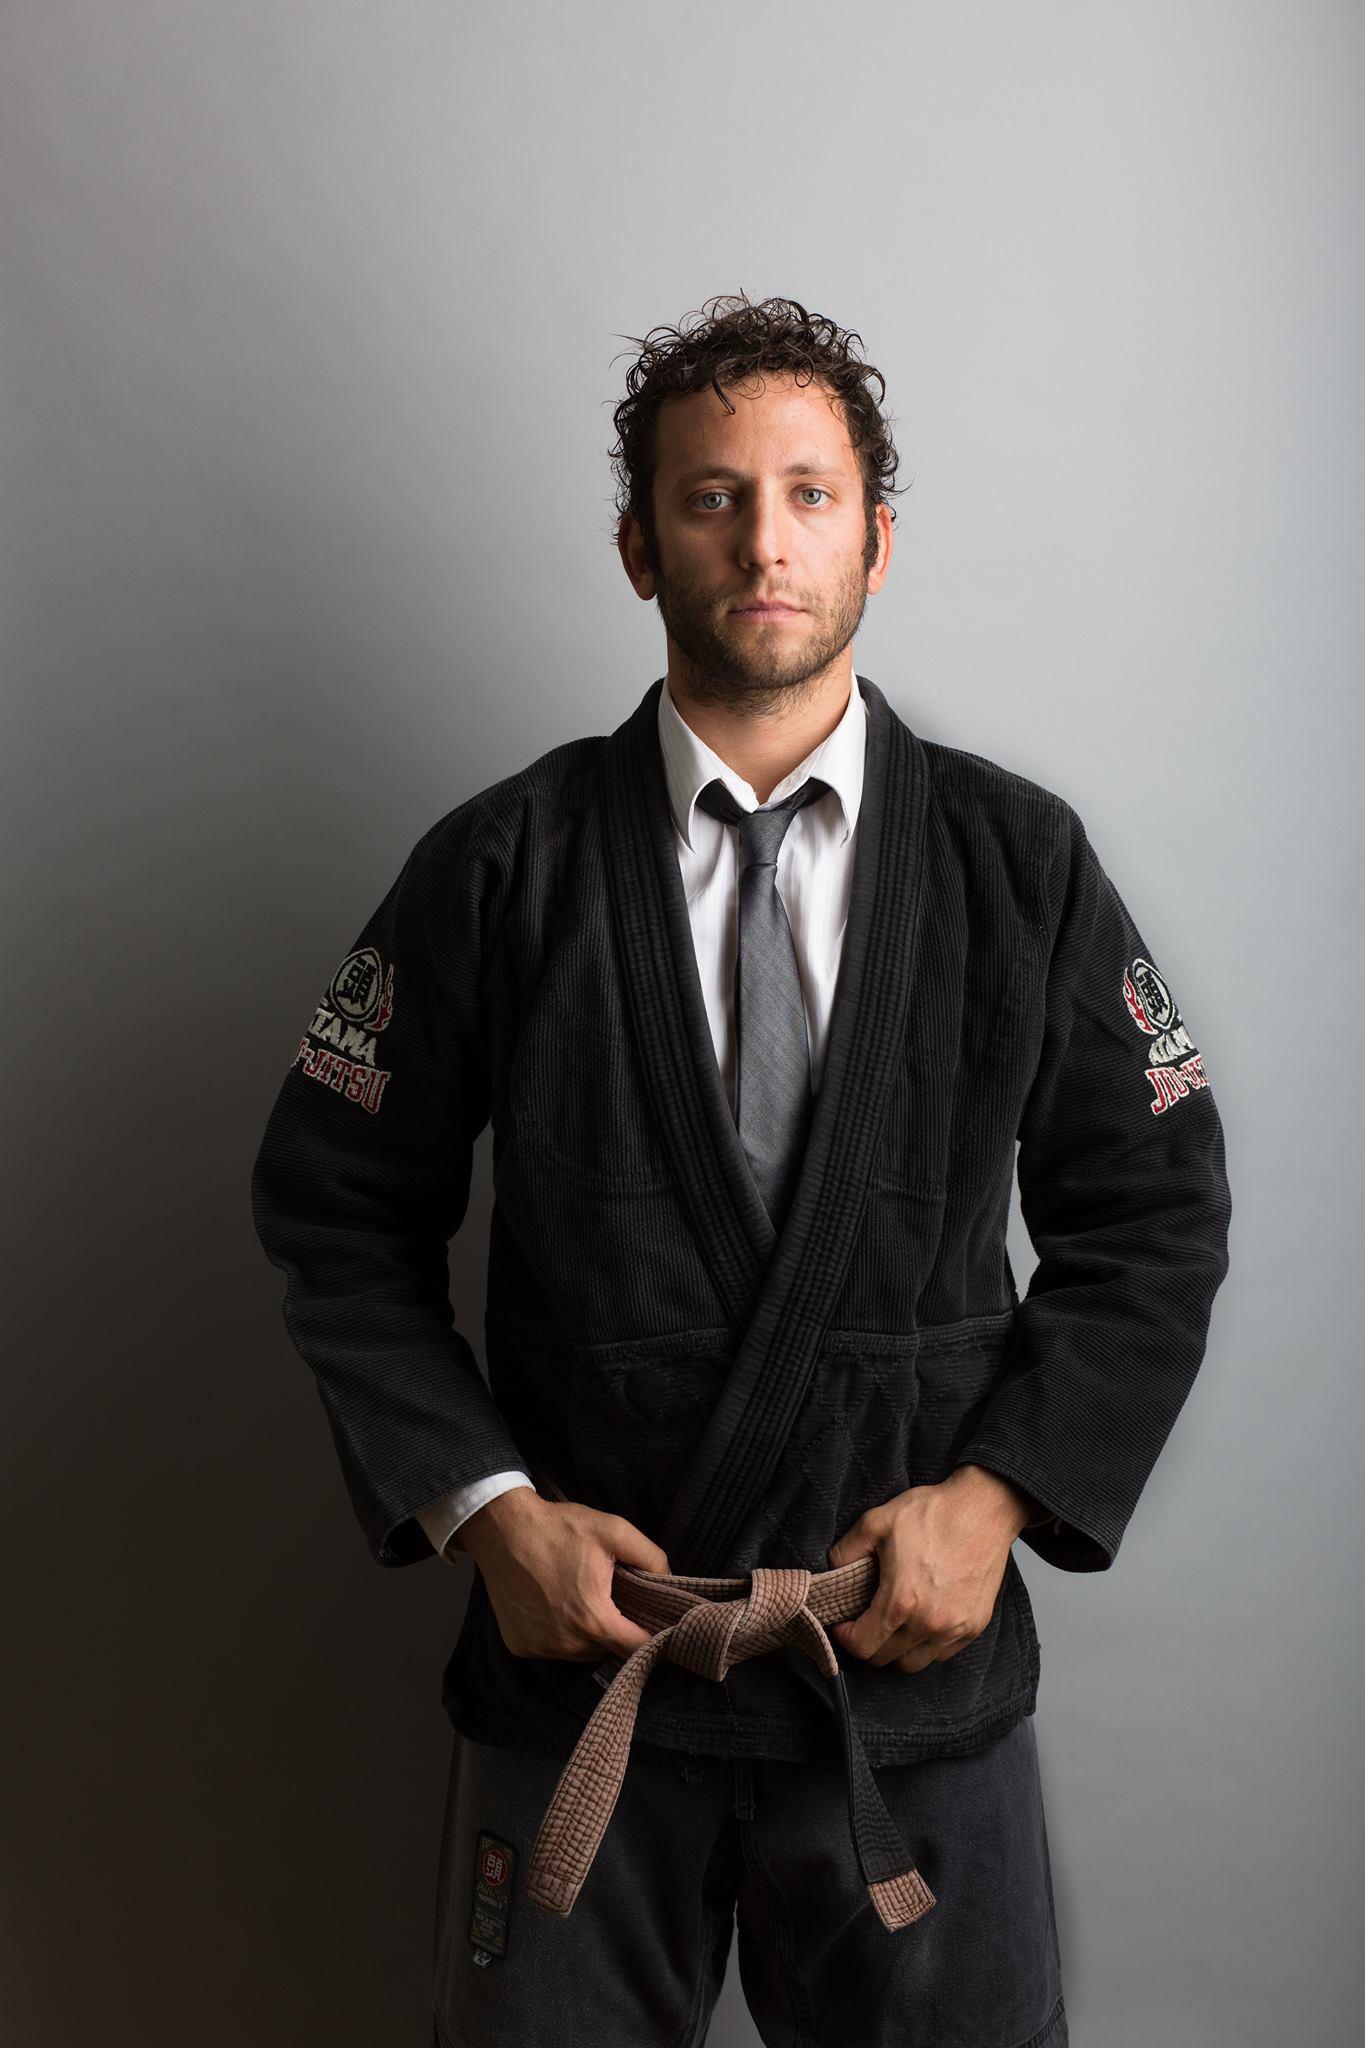 Mik Millman/People Who Train